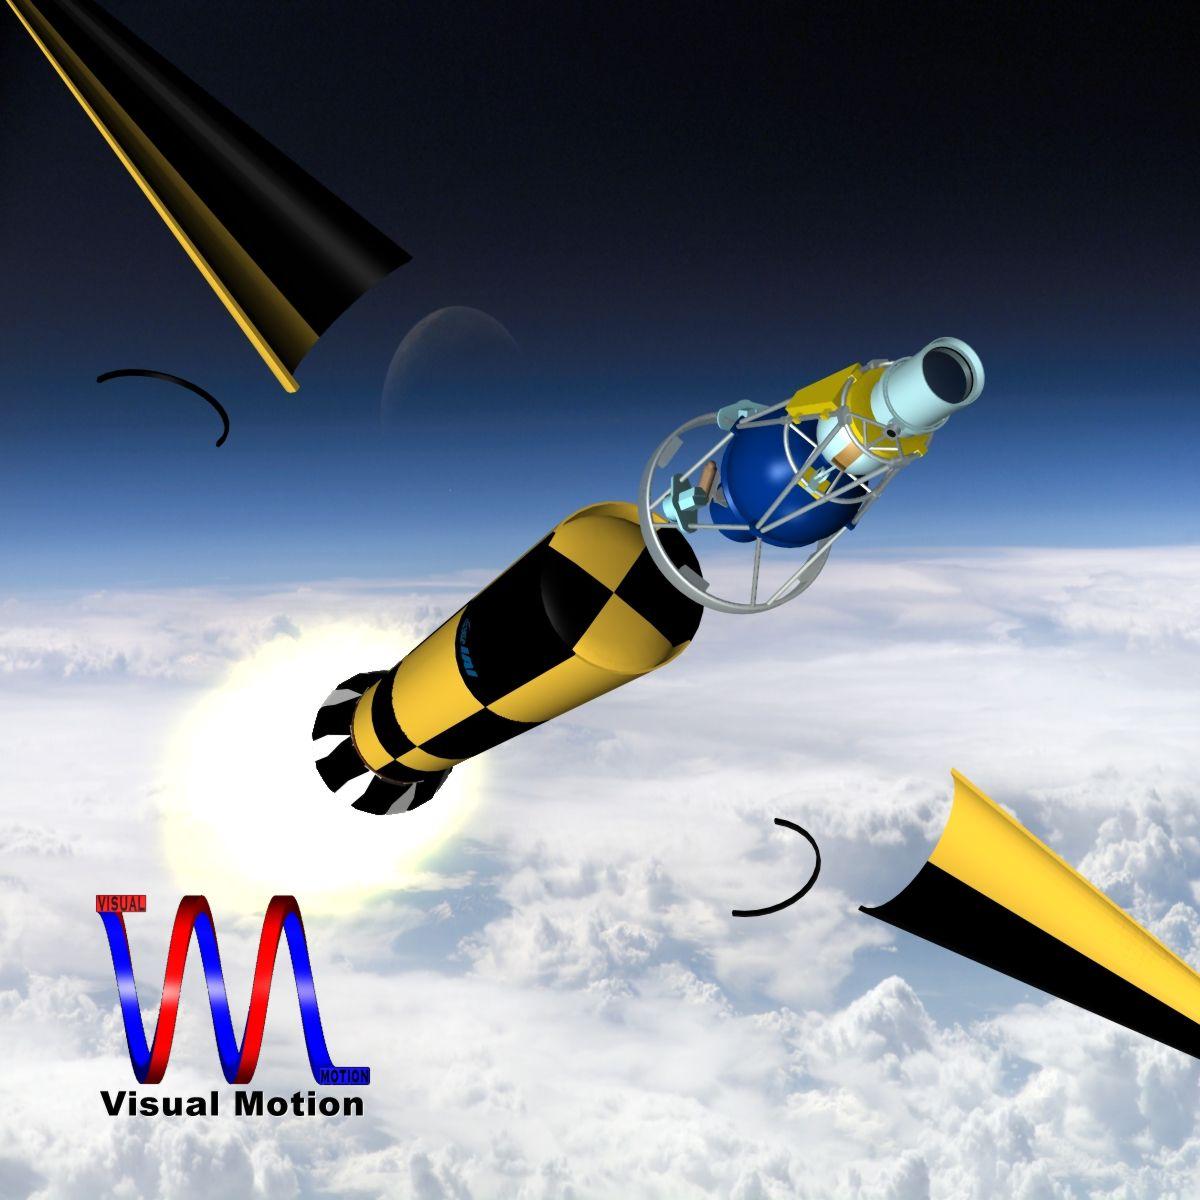 israeli arrow 3 missile 3d model 3ds dxf cob x other obj 136283